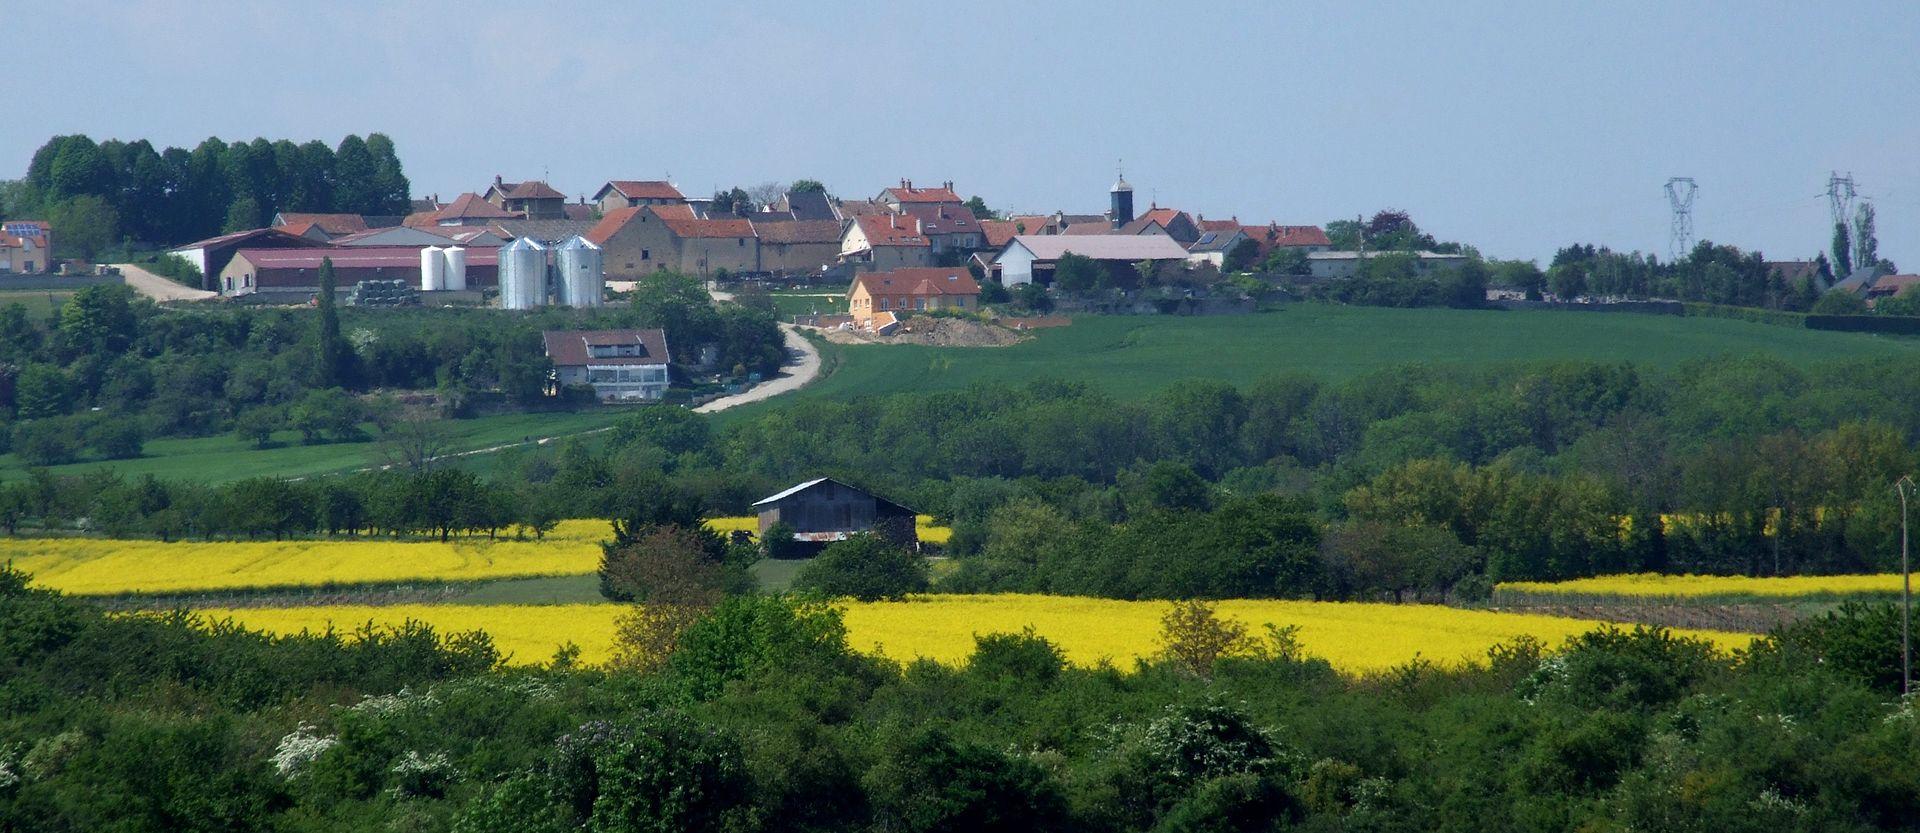 Hauteville-lès-Dijon